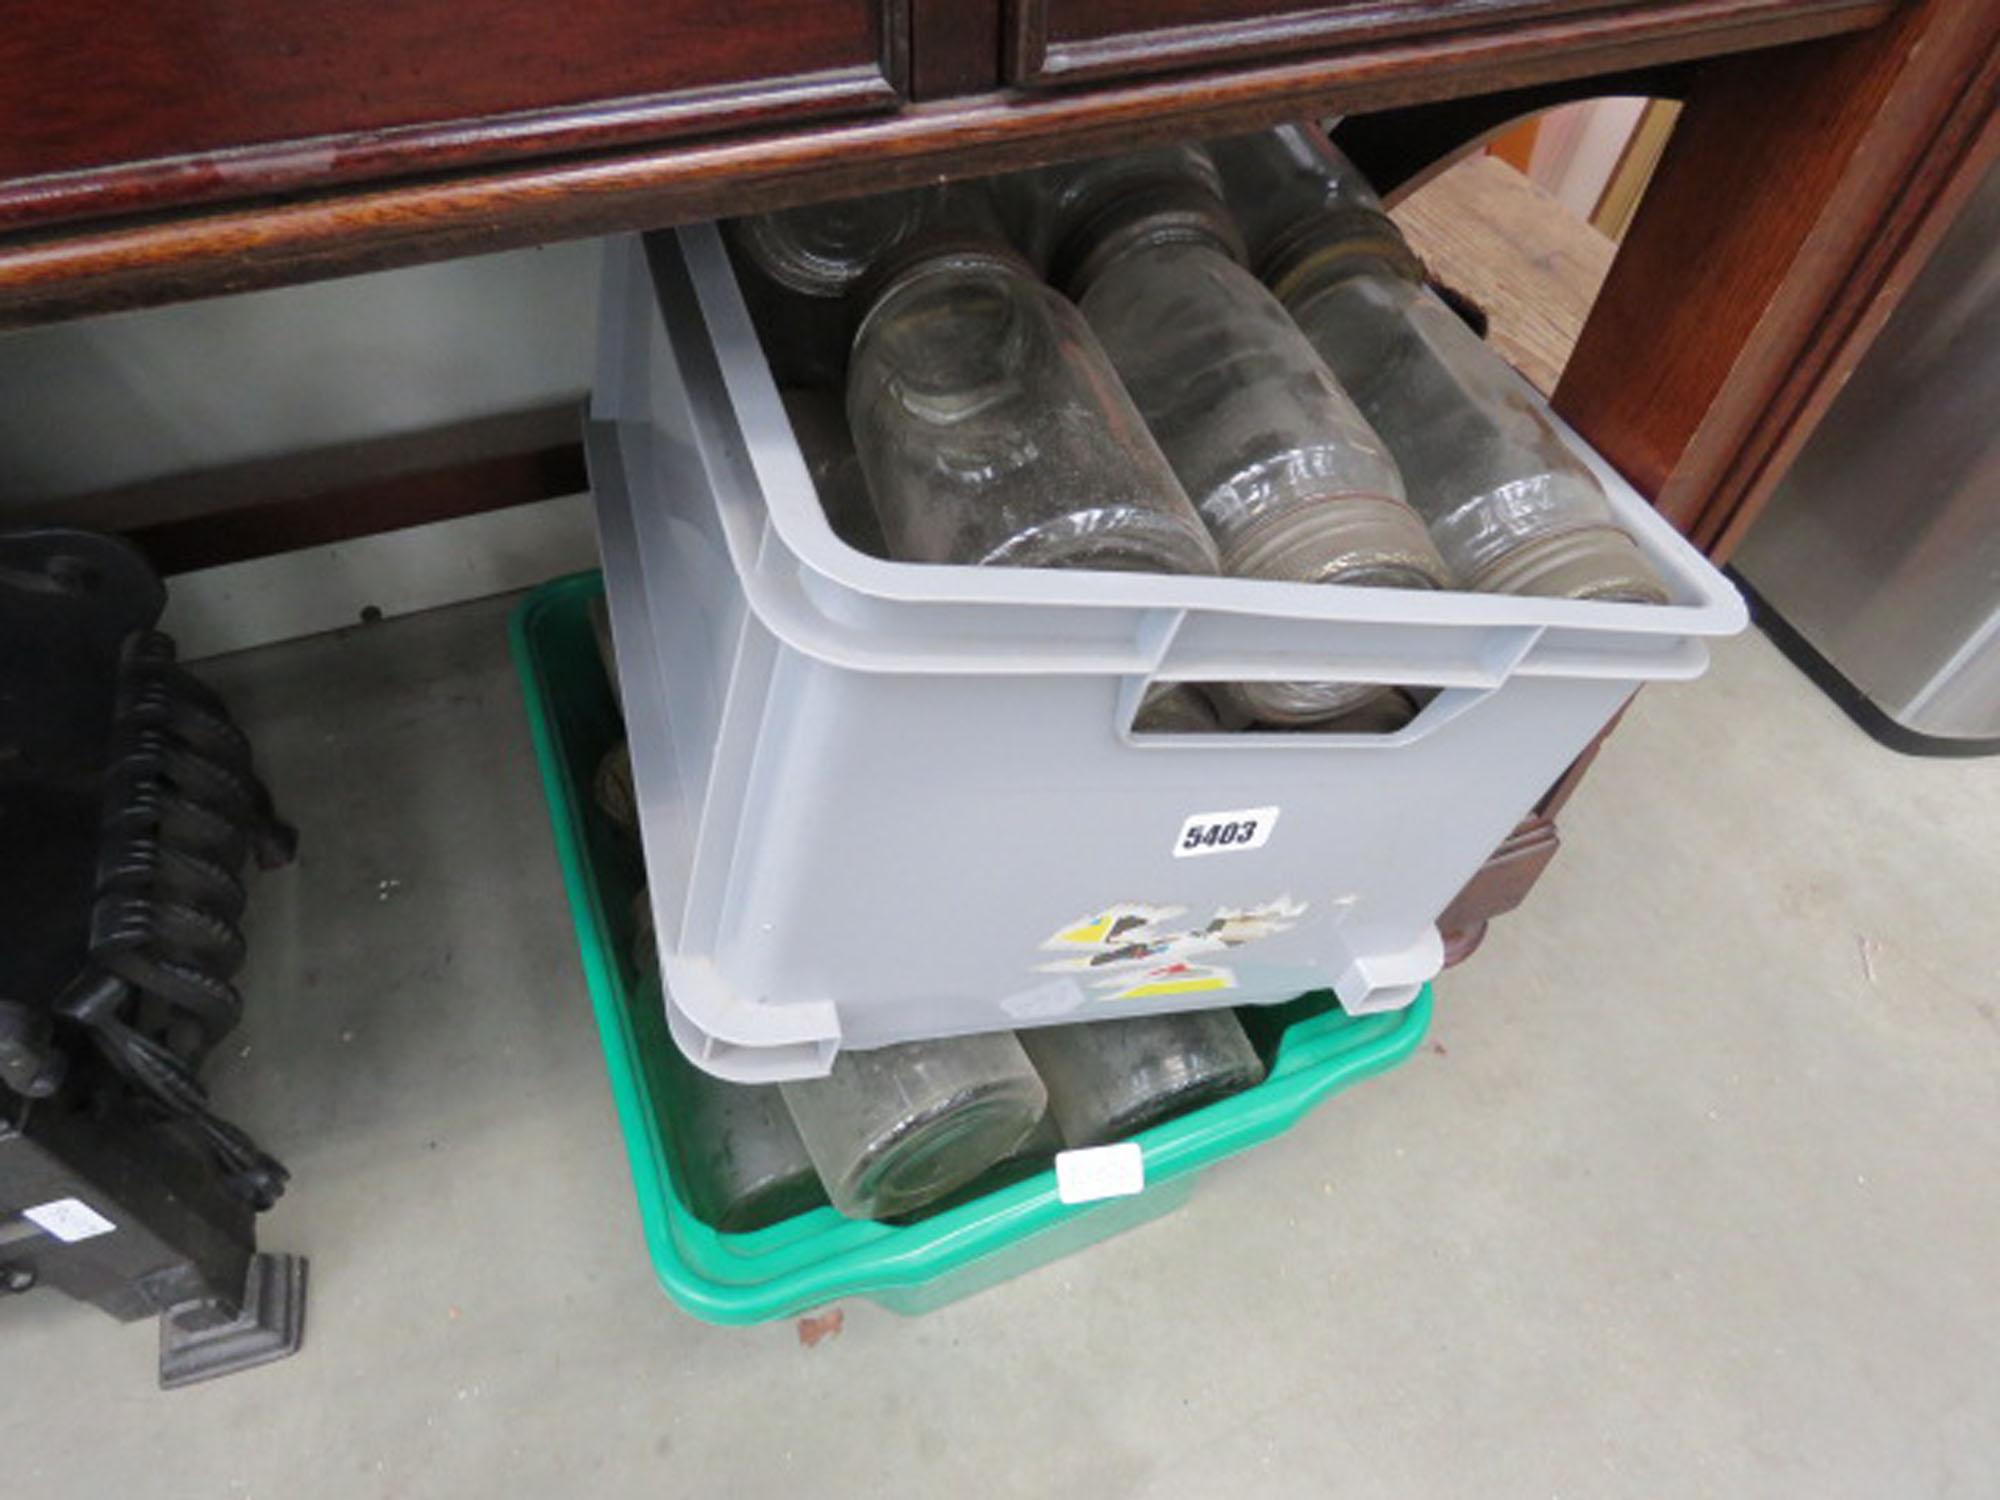 2 boxes containing kilner jars